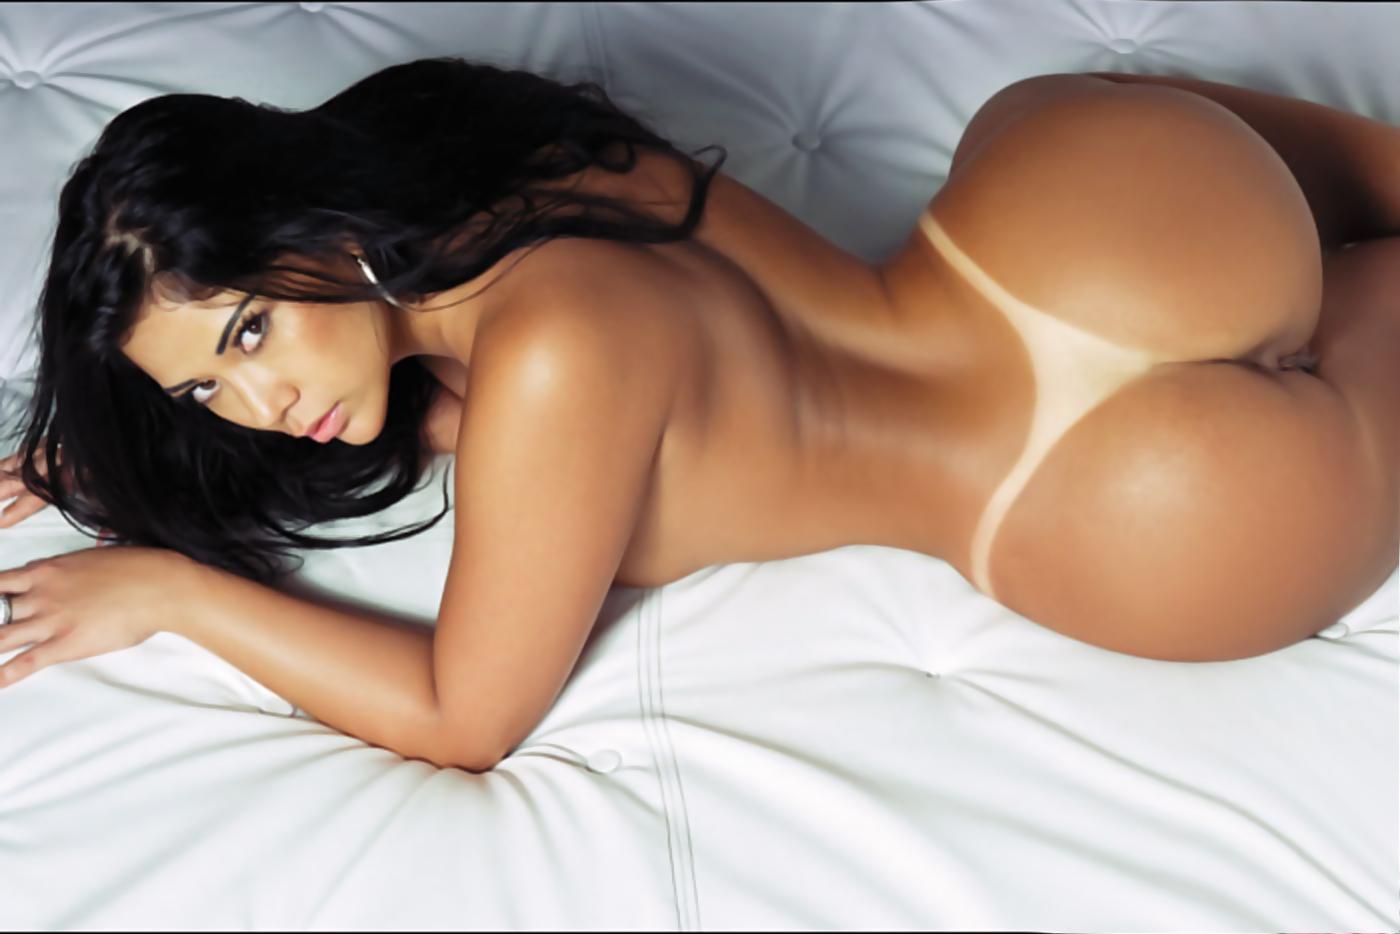 Секси бедра девок 3 фотография